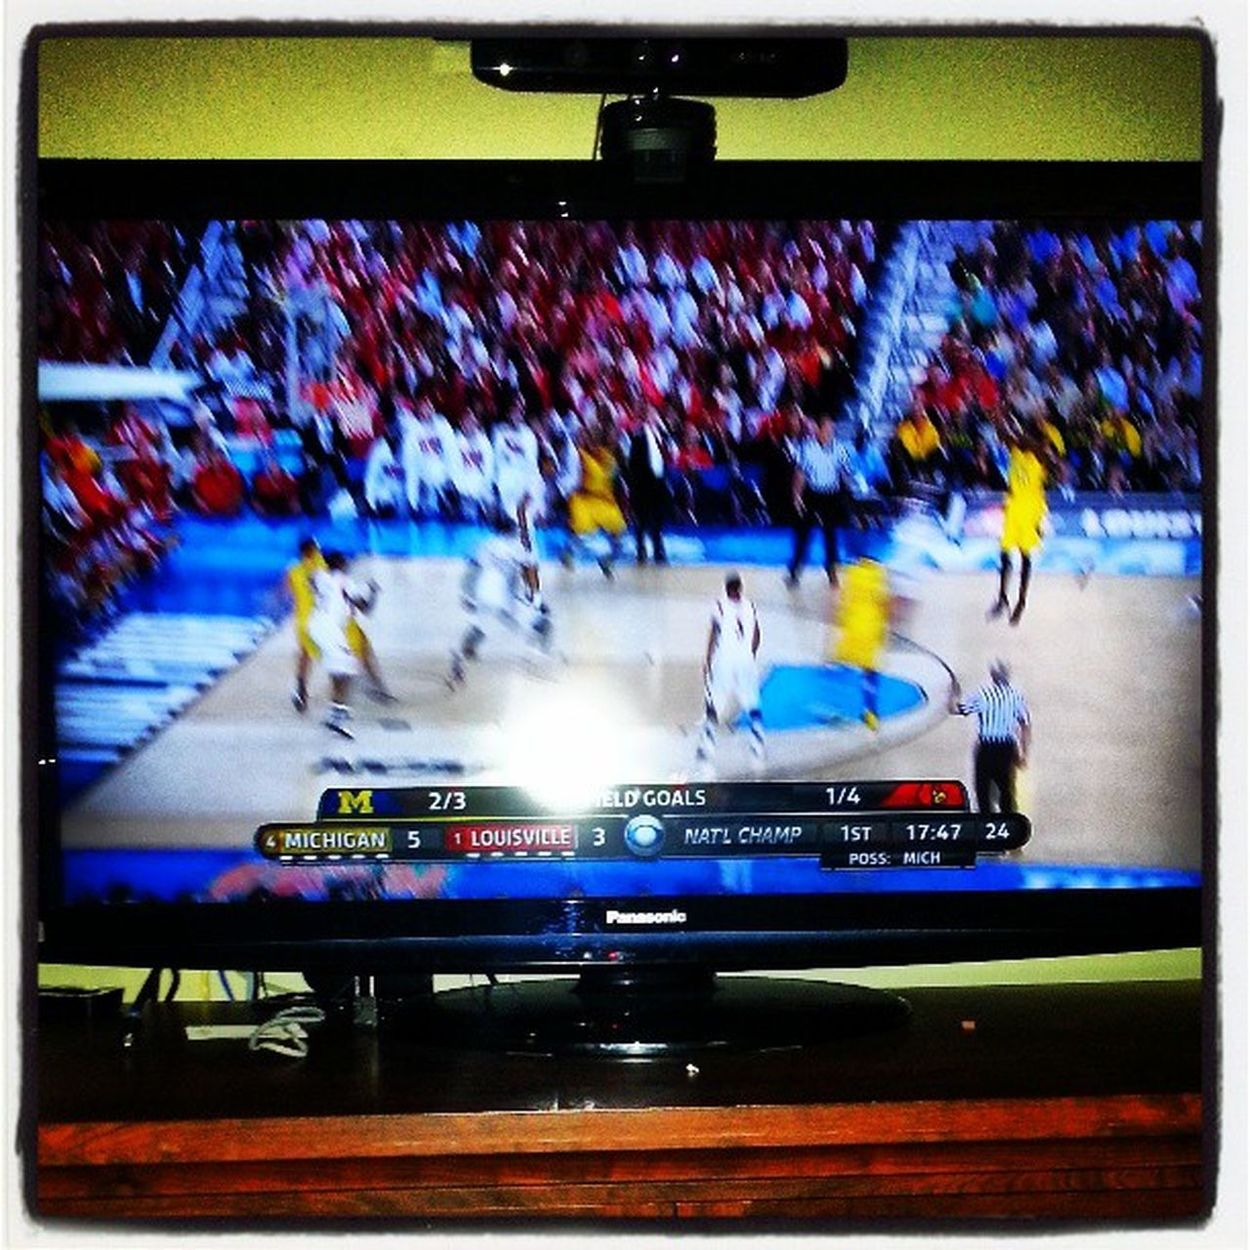 GoBlue Amidreaming Cbs NCAA Champion Wolverines